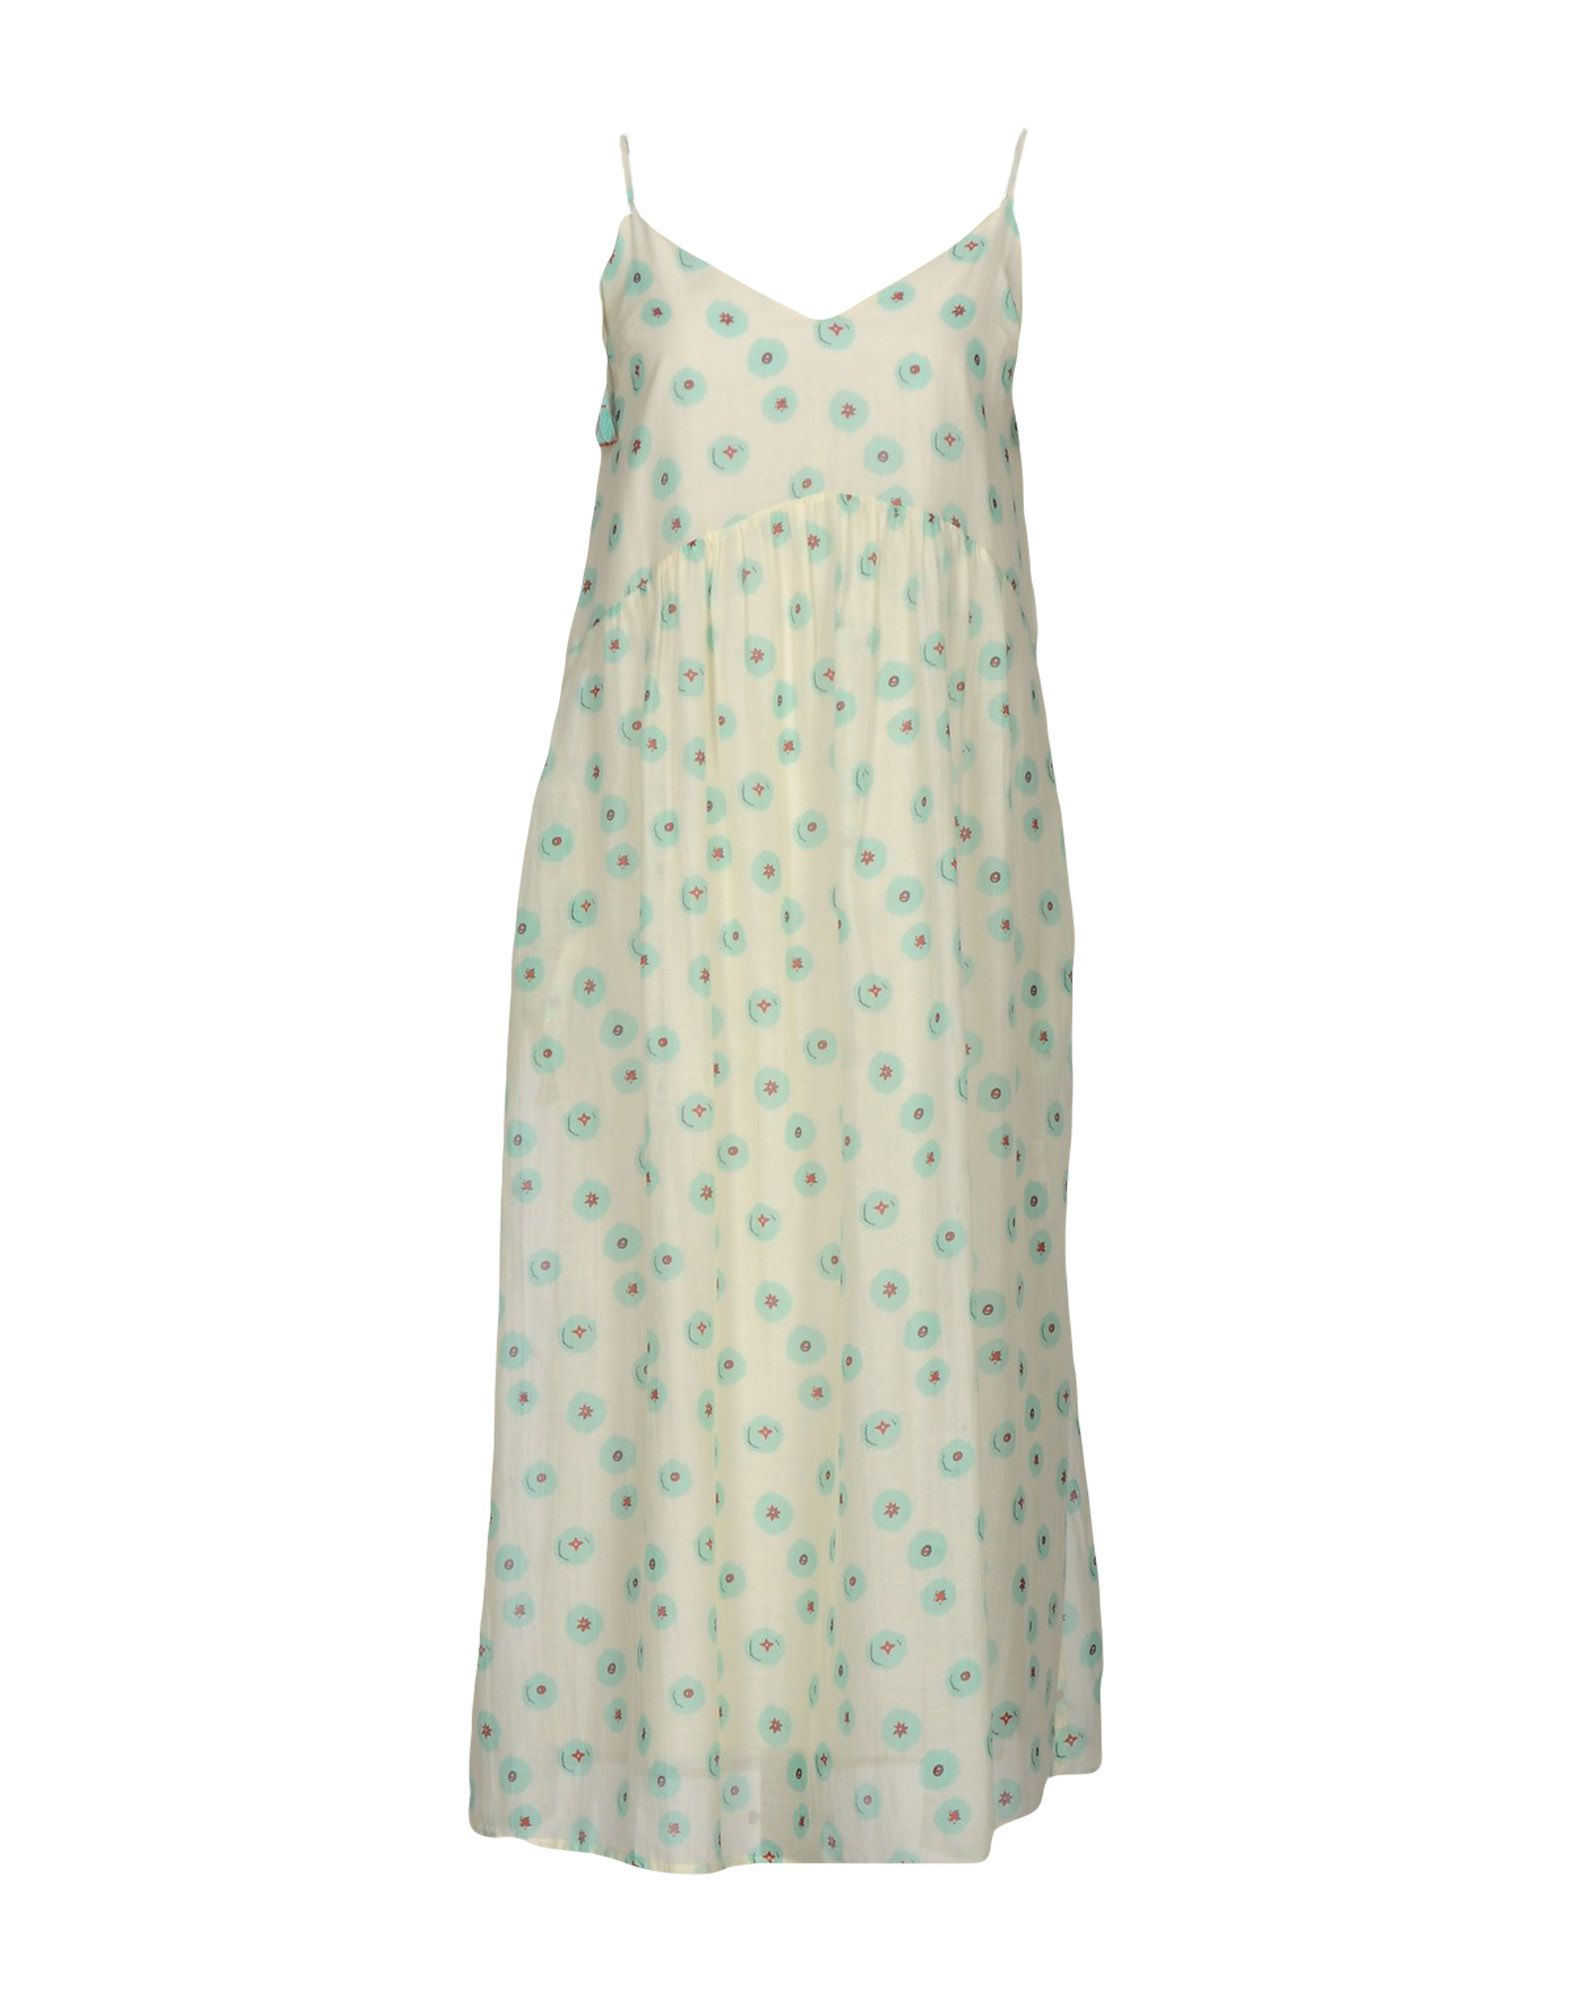 SUOLI Платье длиной 3/4 tenax платье длиной 3 4